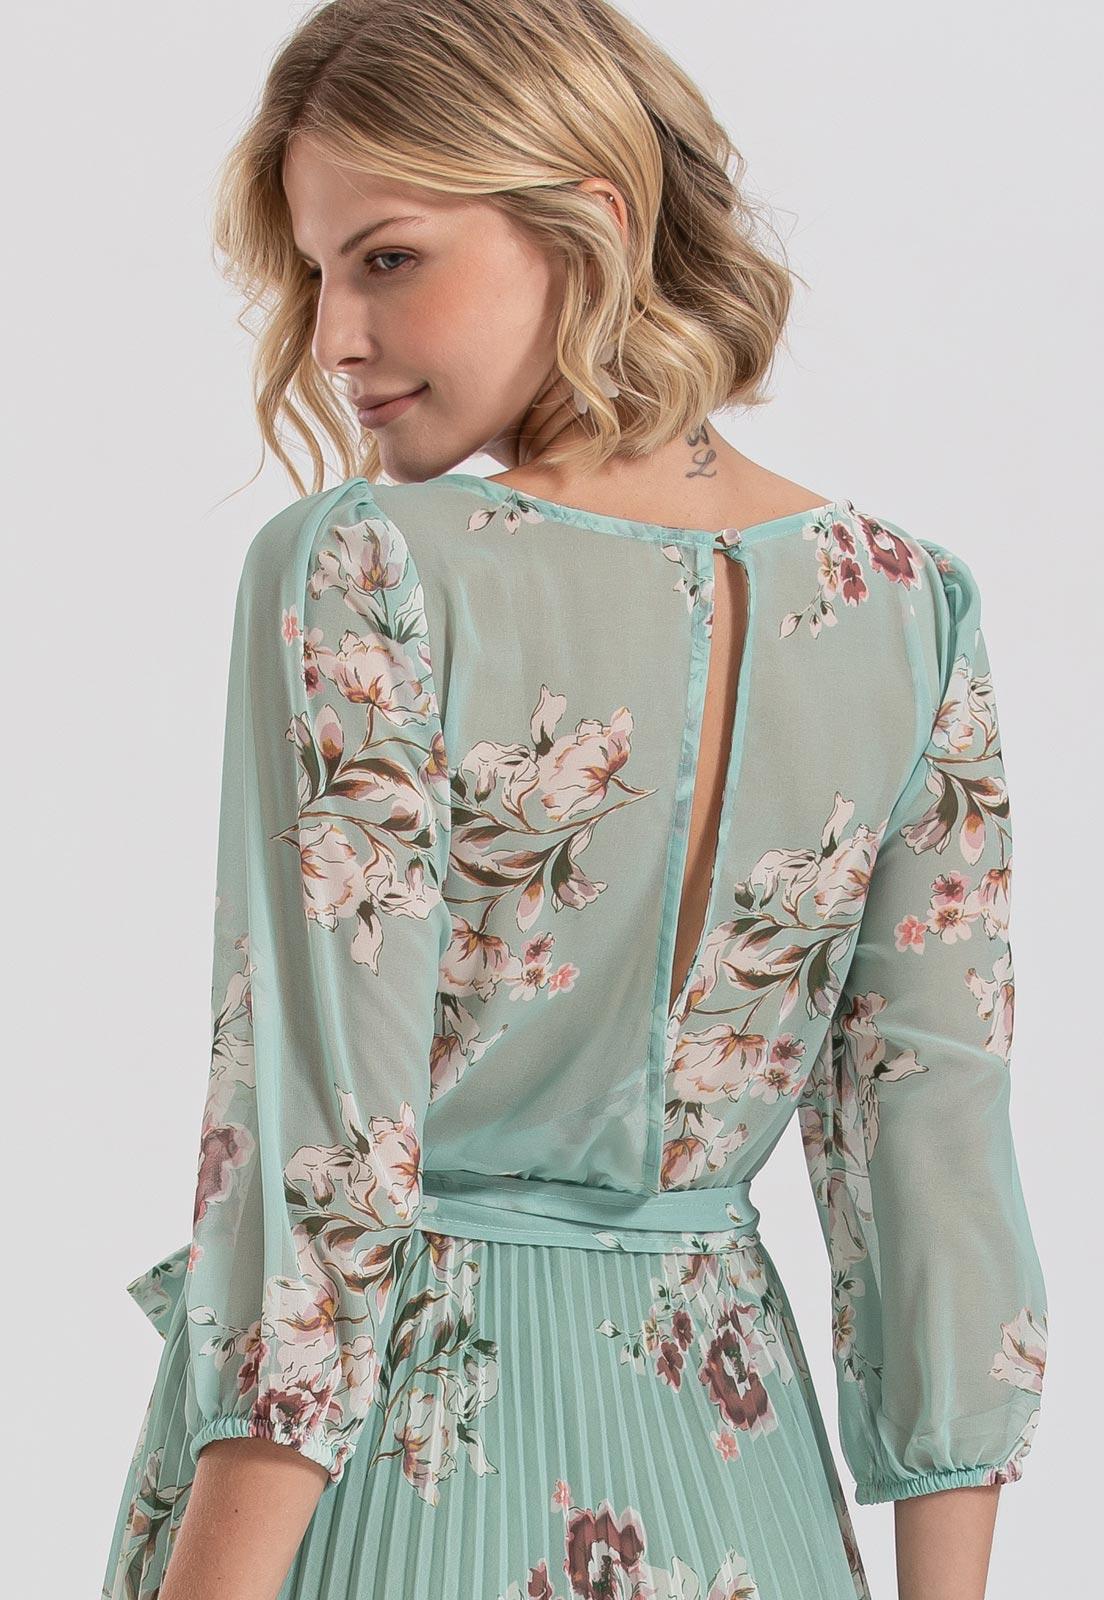 Vestido plissado floral detalhes